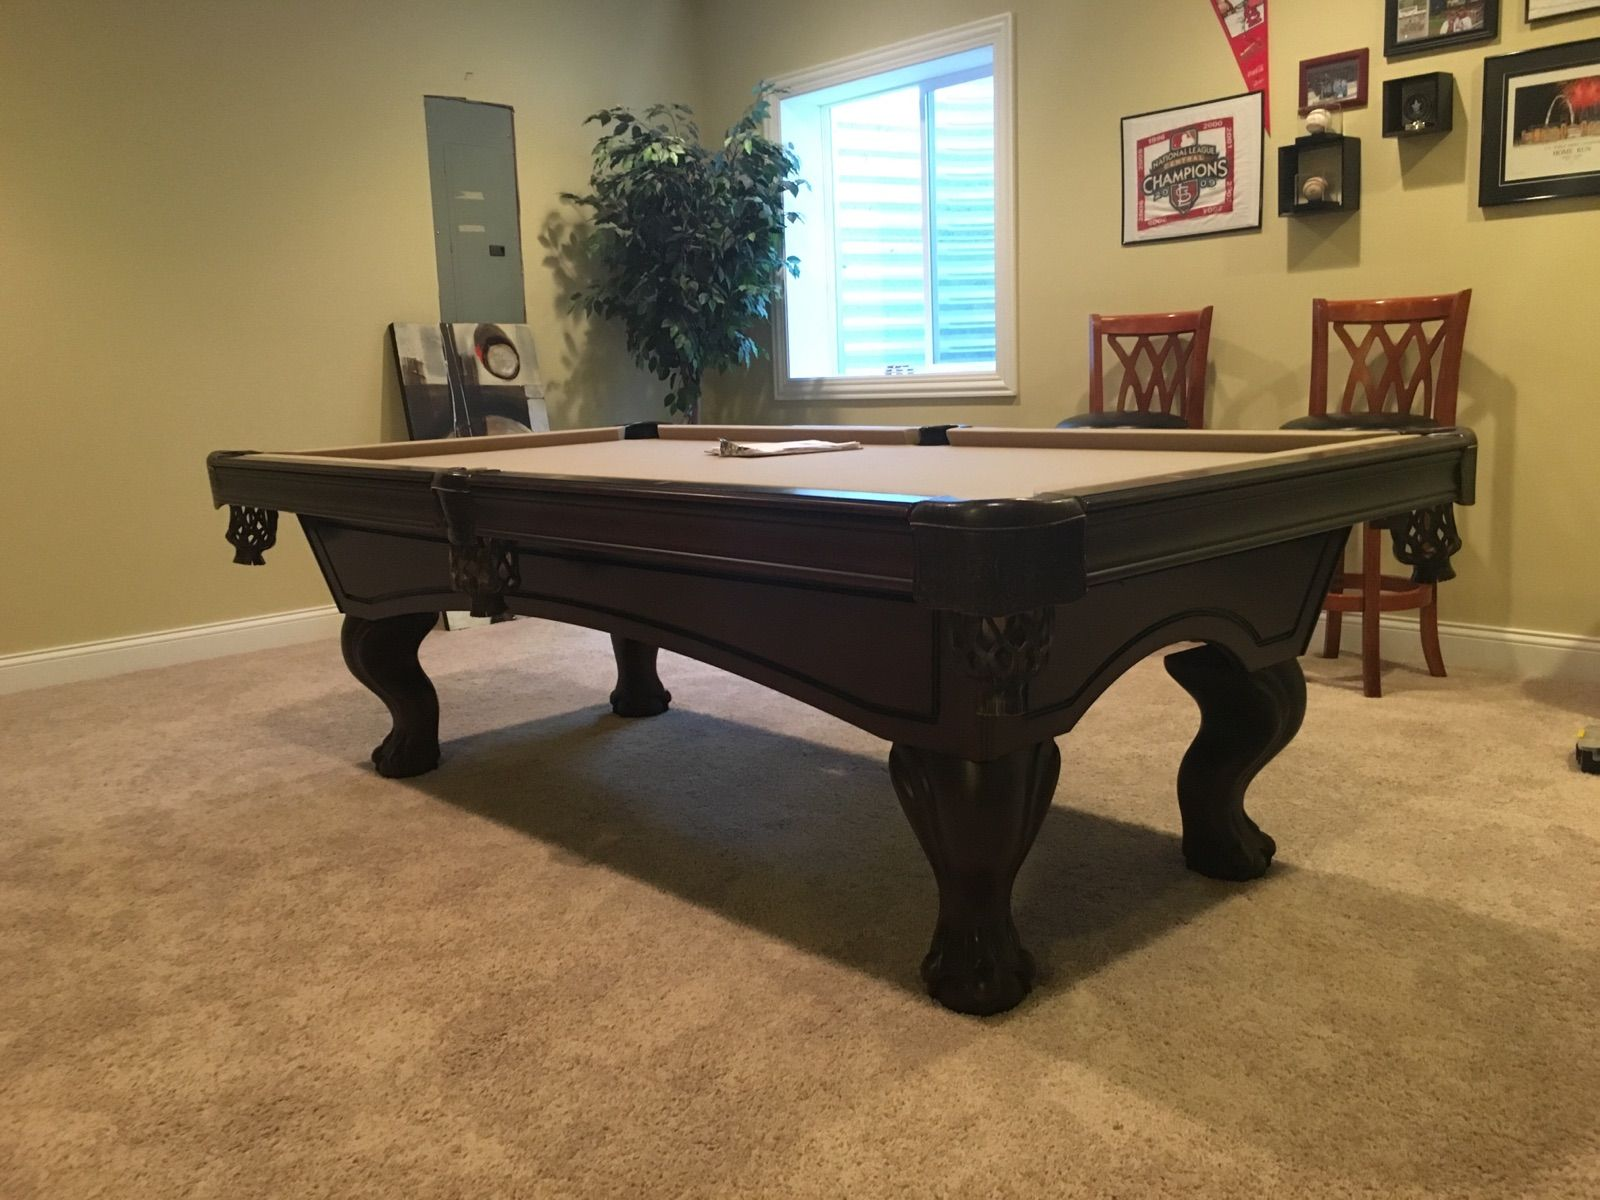 American Heritage Billiards Pool Table 9 16 Sold With Images Billiard Pool Table Pool Table Movers Billiards Pool